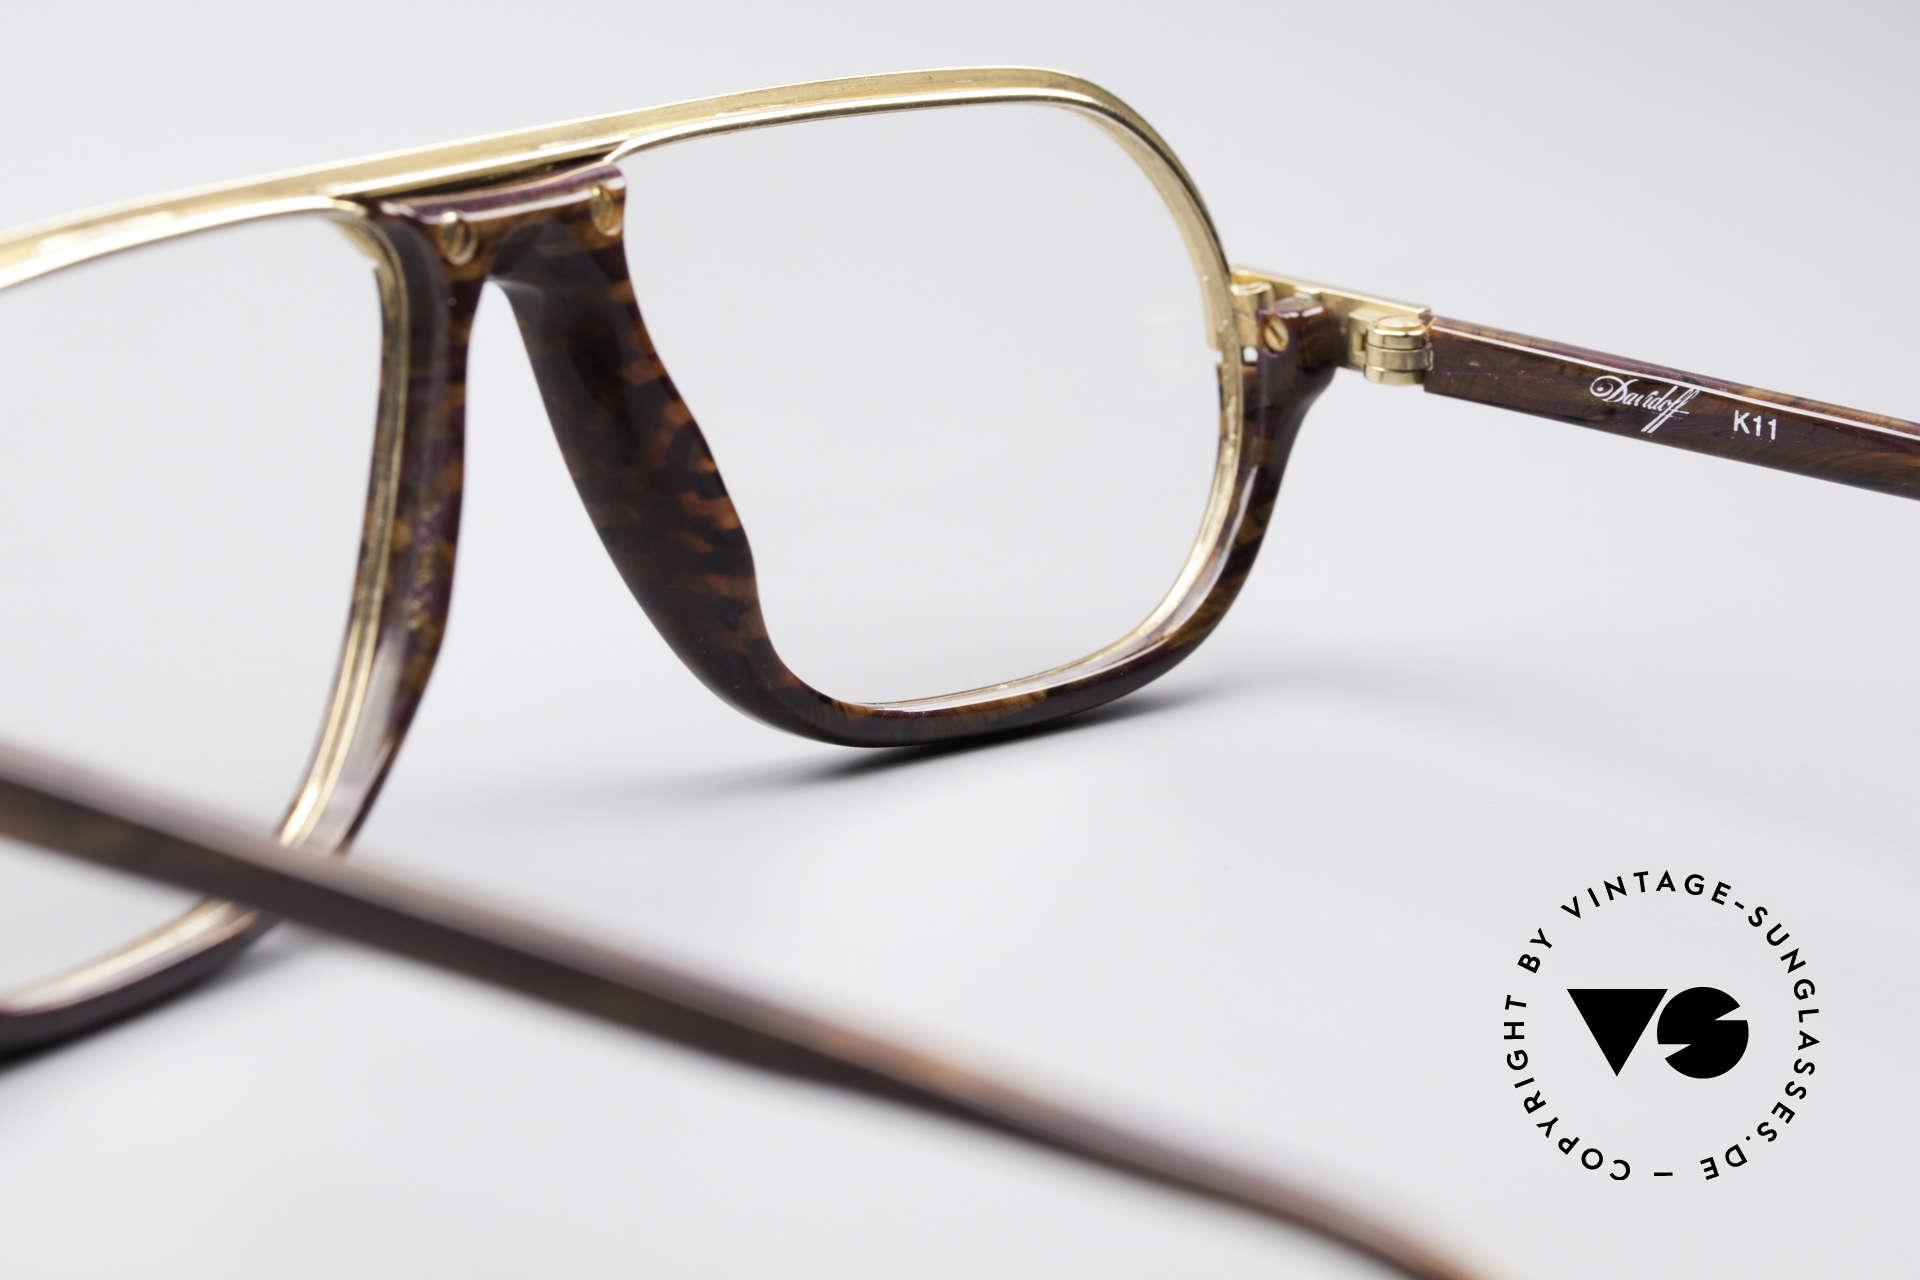 Davidoff 300 Small Men's Vintage Glasses, Size: medium, Made for Men